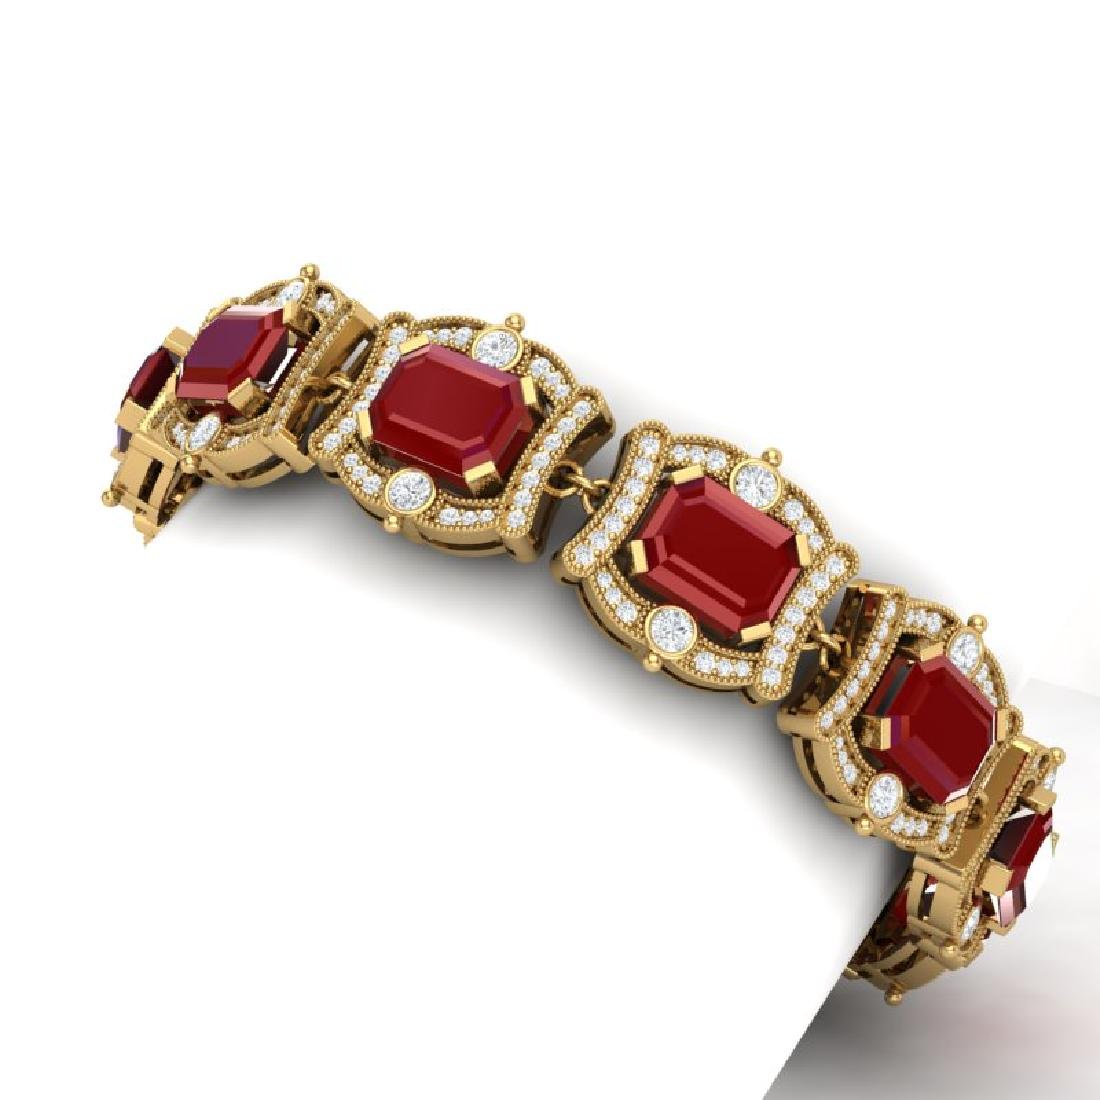 43.87 CTW Royalty Ruby & VS Diamond Bracelet 18K Yellow - 2